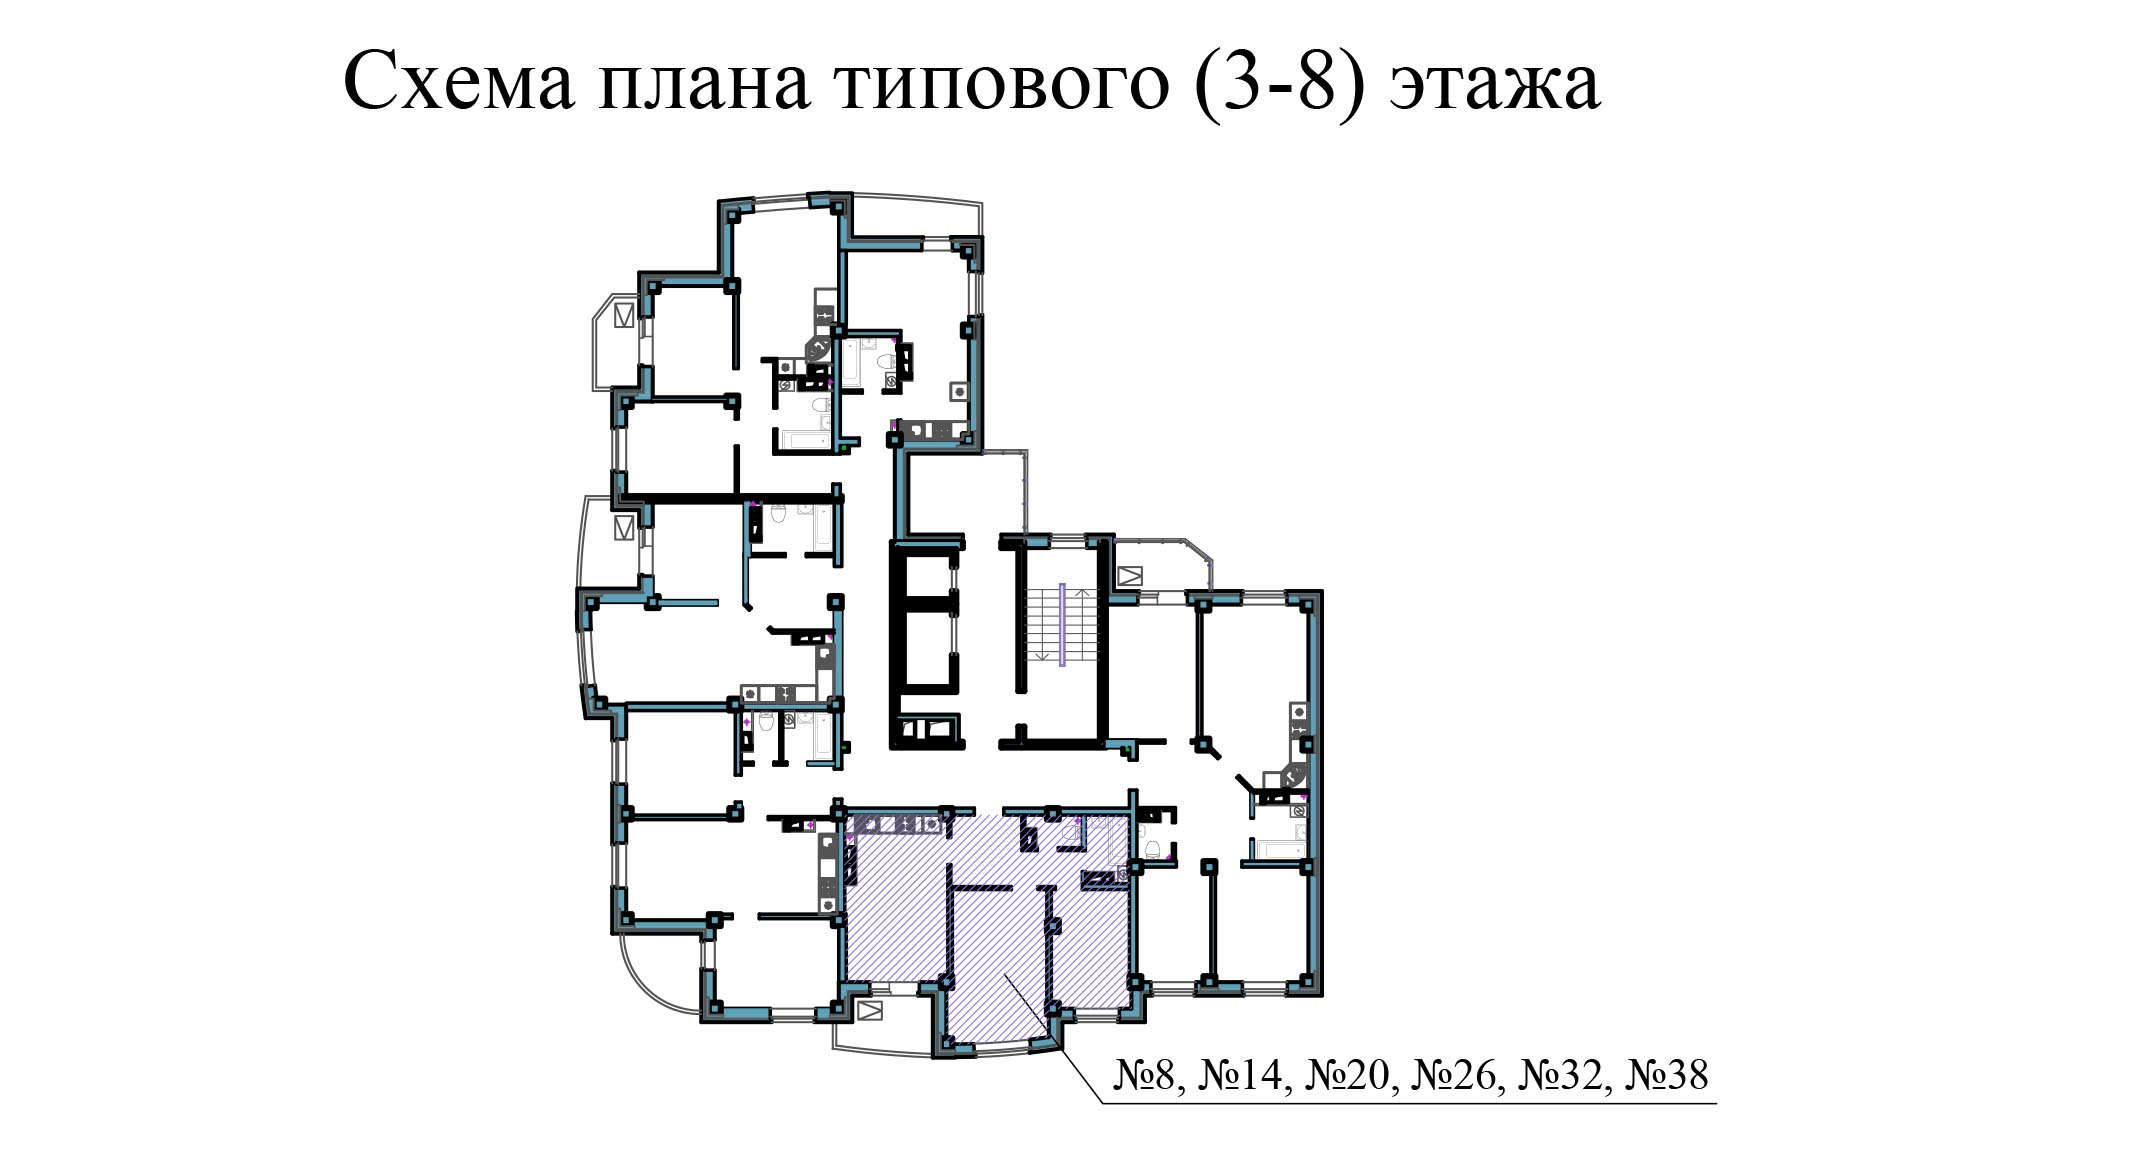 Двухкомнатная квартира - ул.Балтийская, д. 1а, кв. 8, 14,20, 26, 32, 38